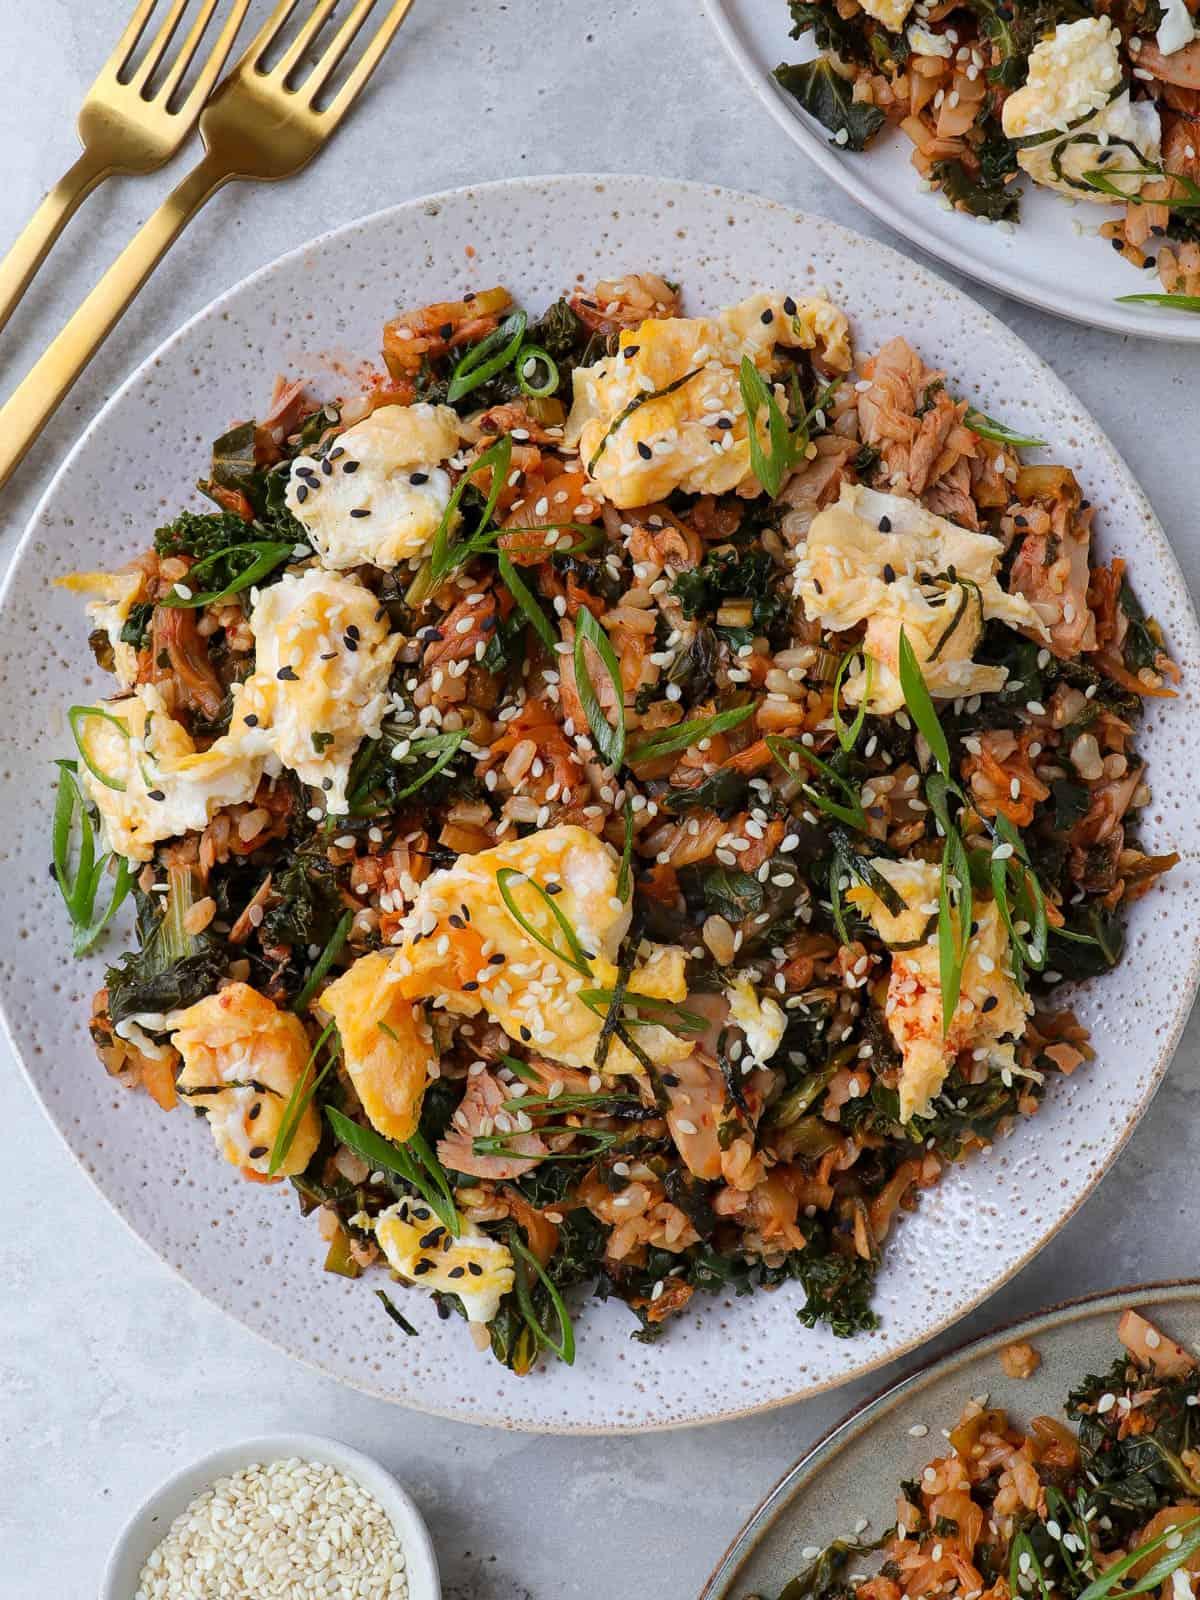 Kimchi fried rice on plate.